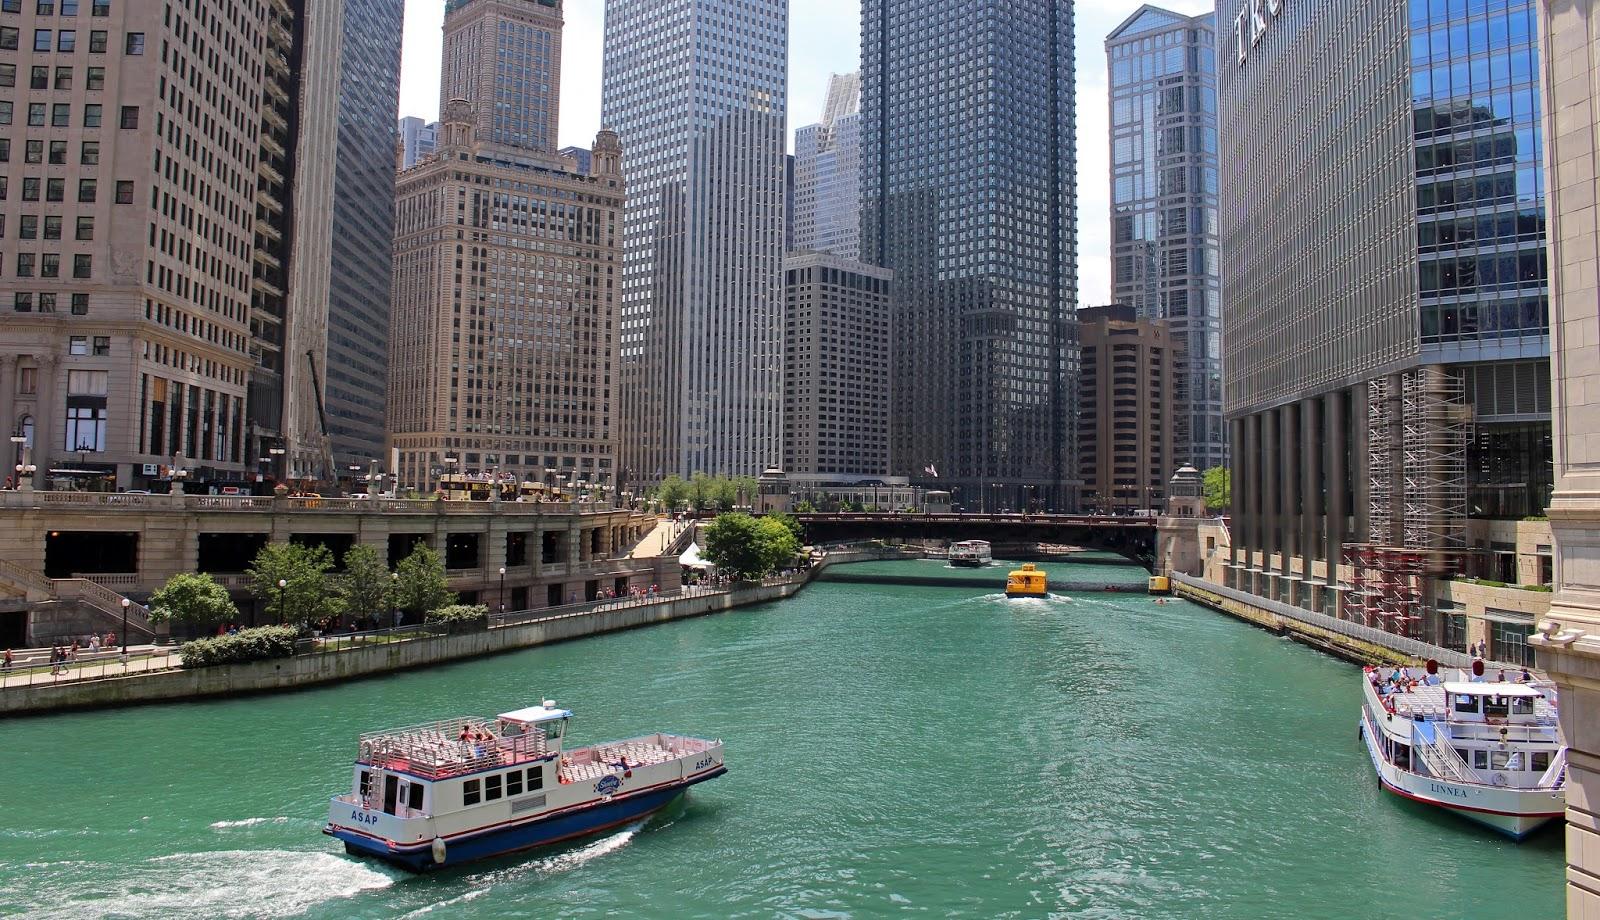 Mesmerizing Chicago Architecture Cruise Design Inspiration Of